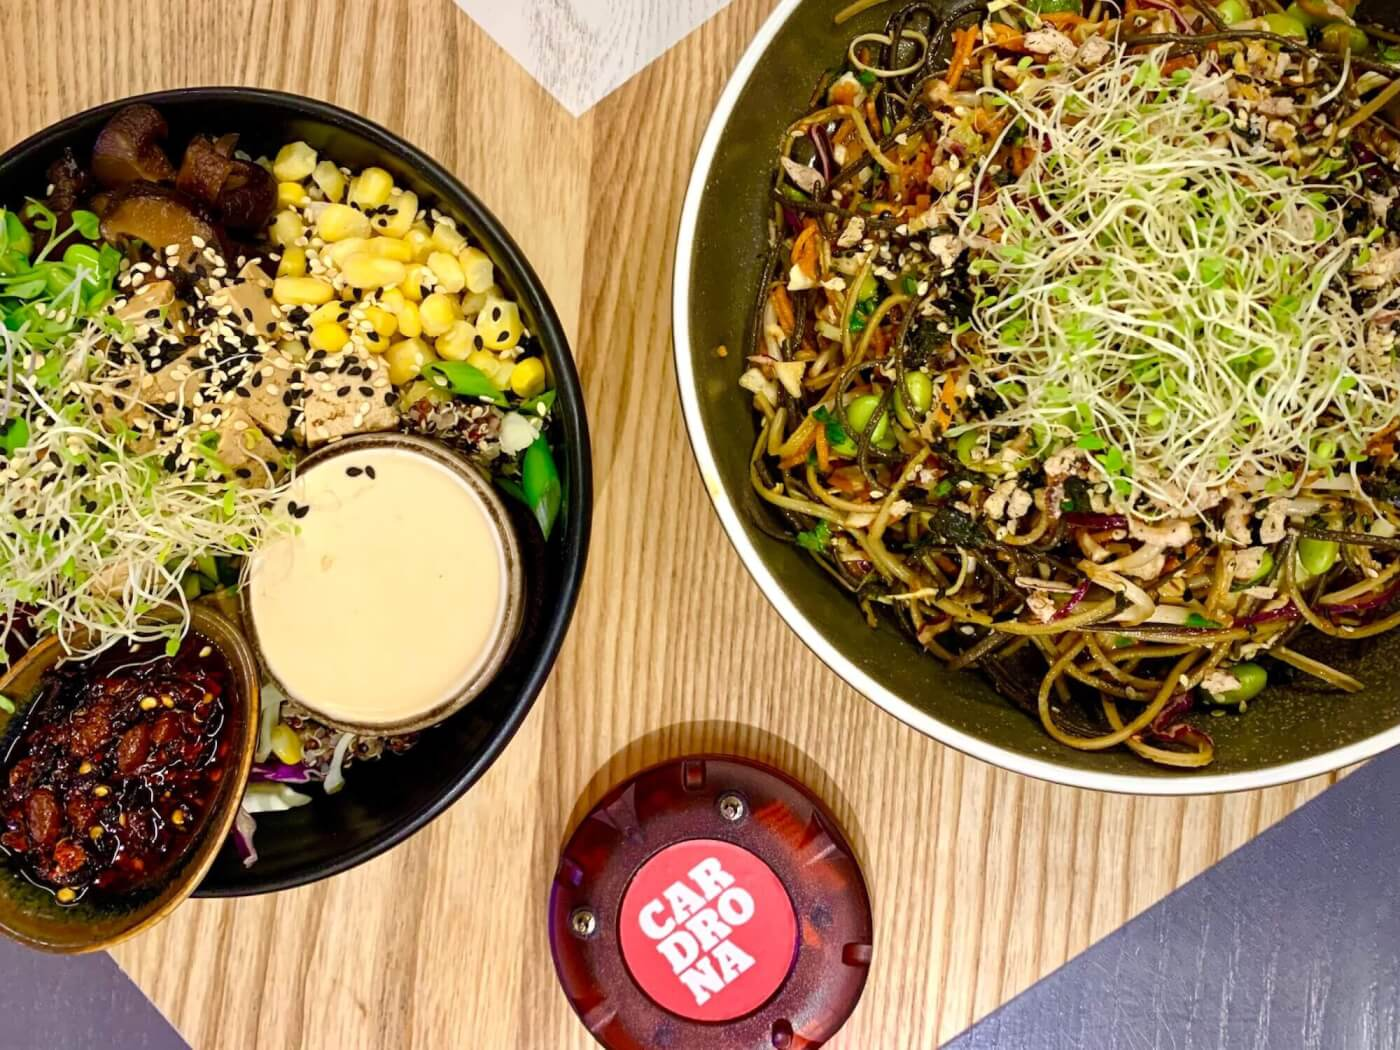 Vegan Buddha Bowl and Noodle Salad at Cardrona